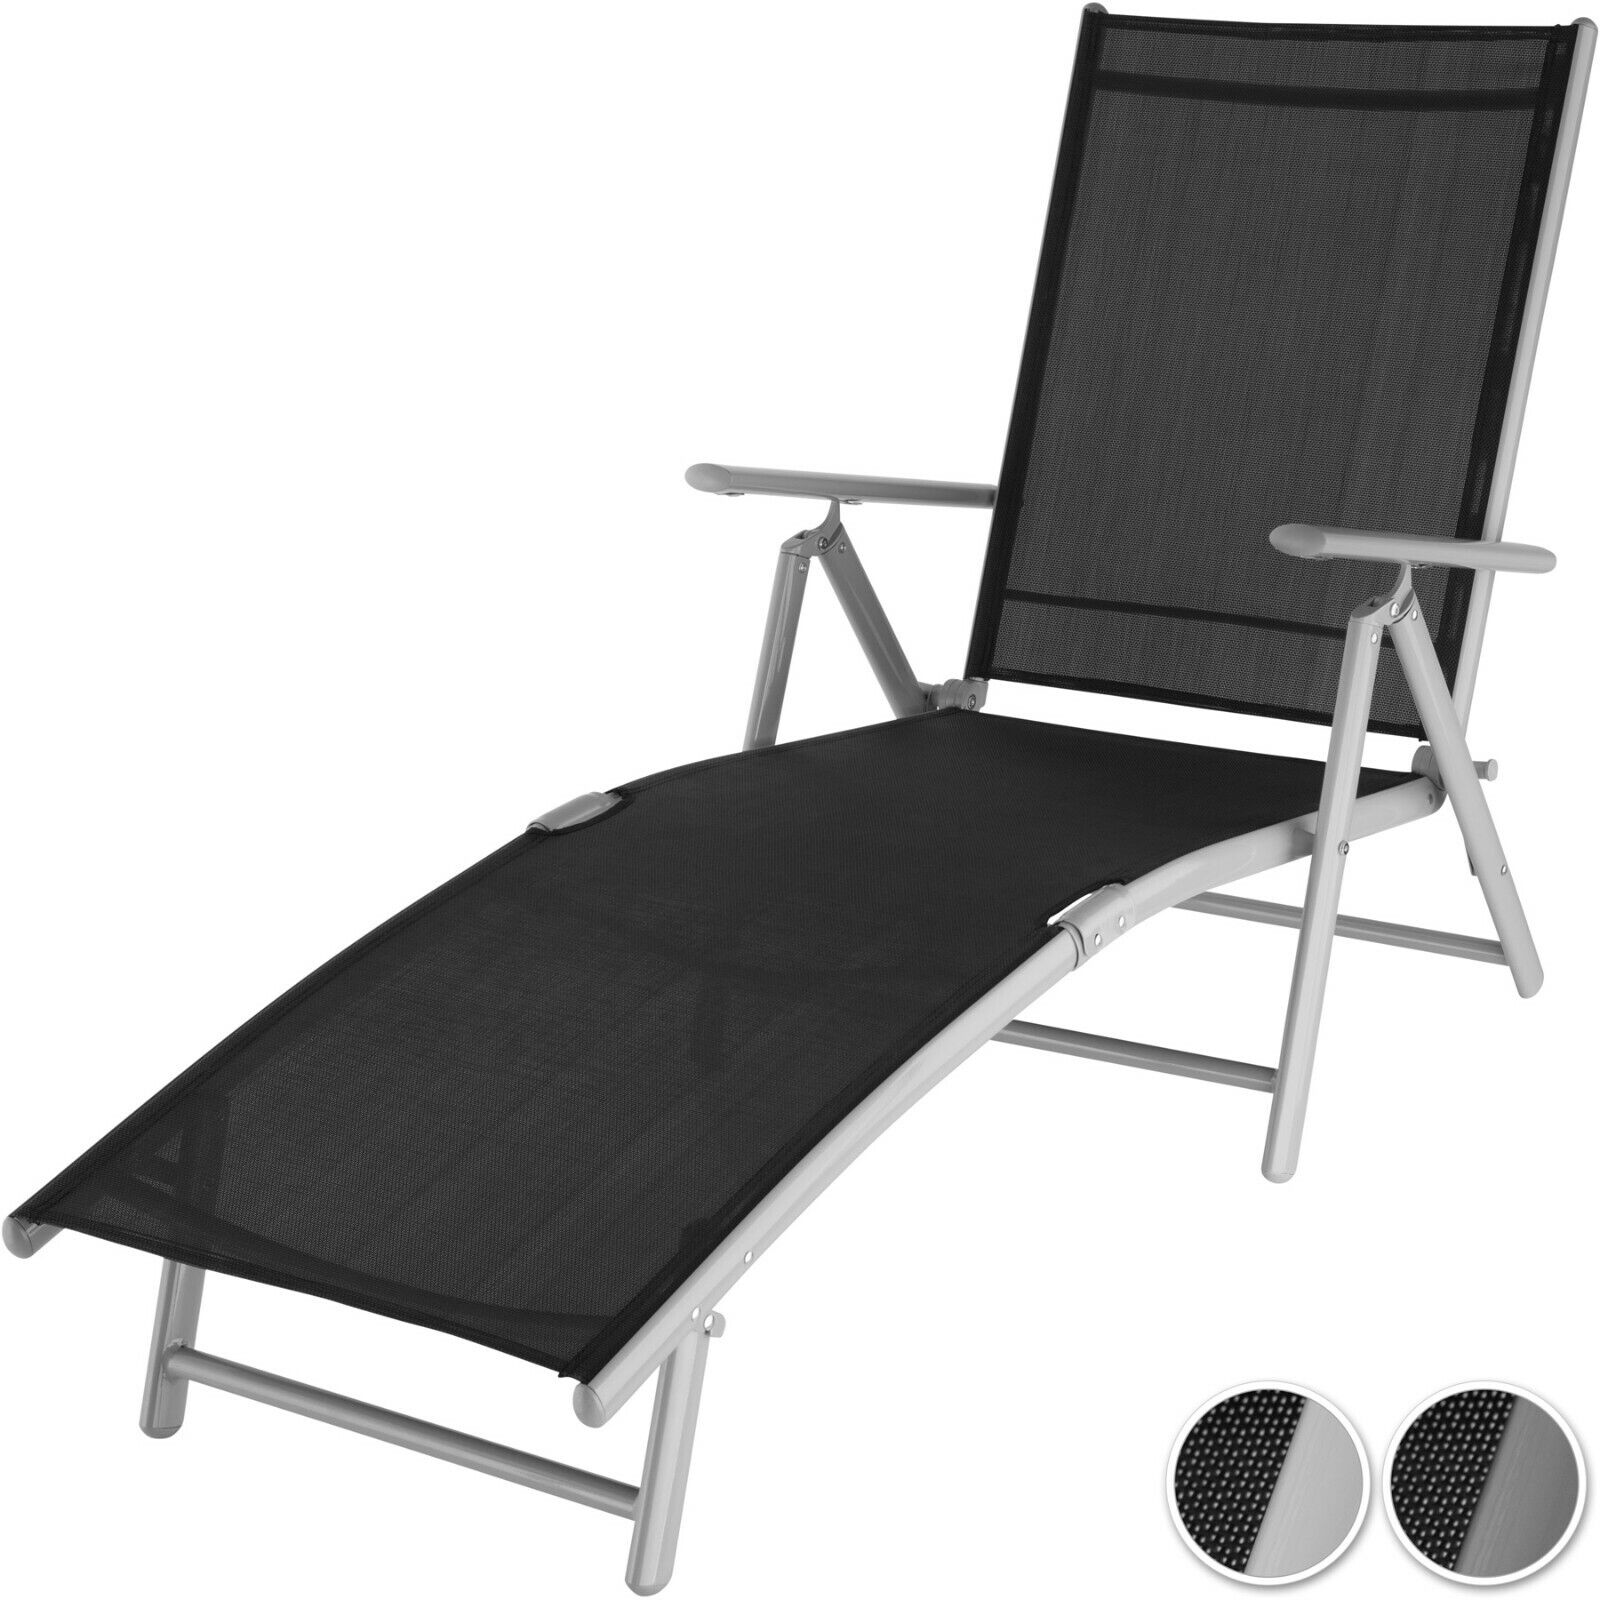 Transat chaise longue bain de soleil jardin piscine pliante relax en aluminium